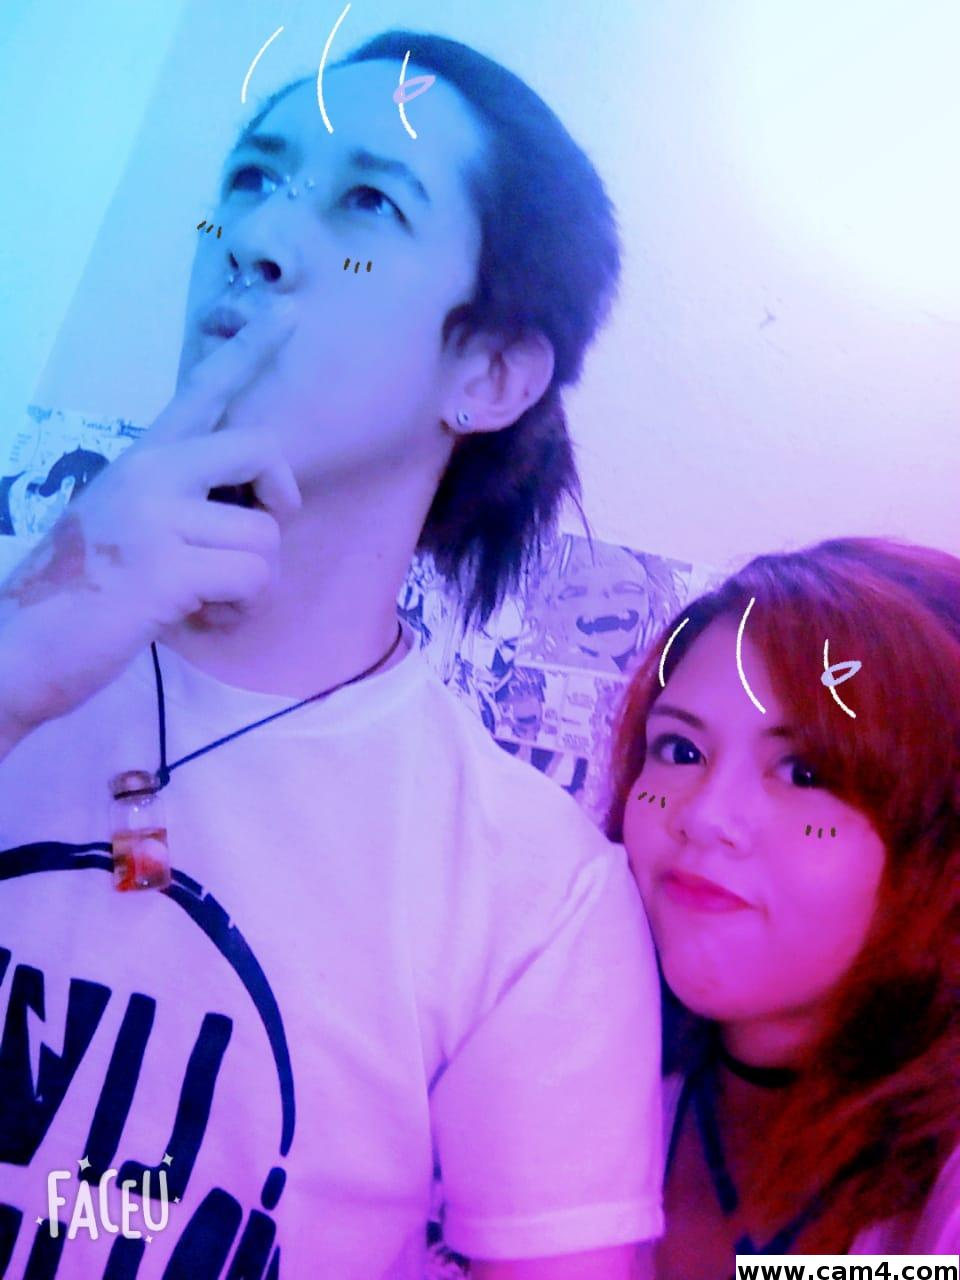 Nakko and tsuki?s=bavfekvwcol2bvjiph3dhpwsl2nrlrmnopdxuz99h2i=